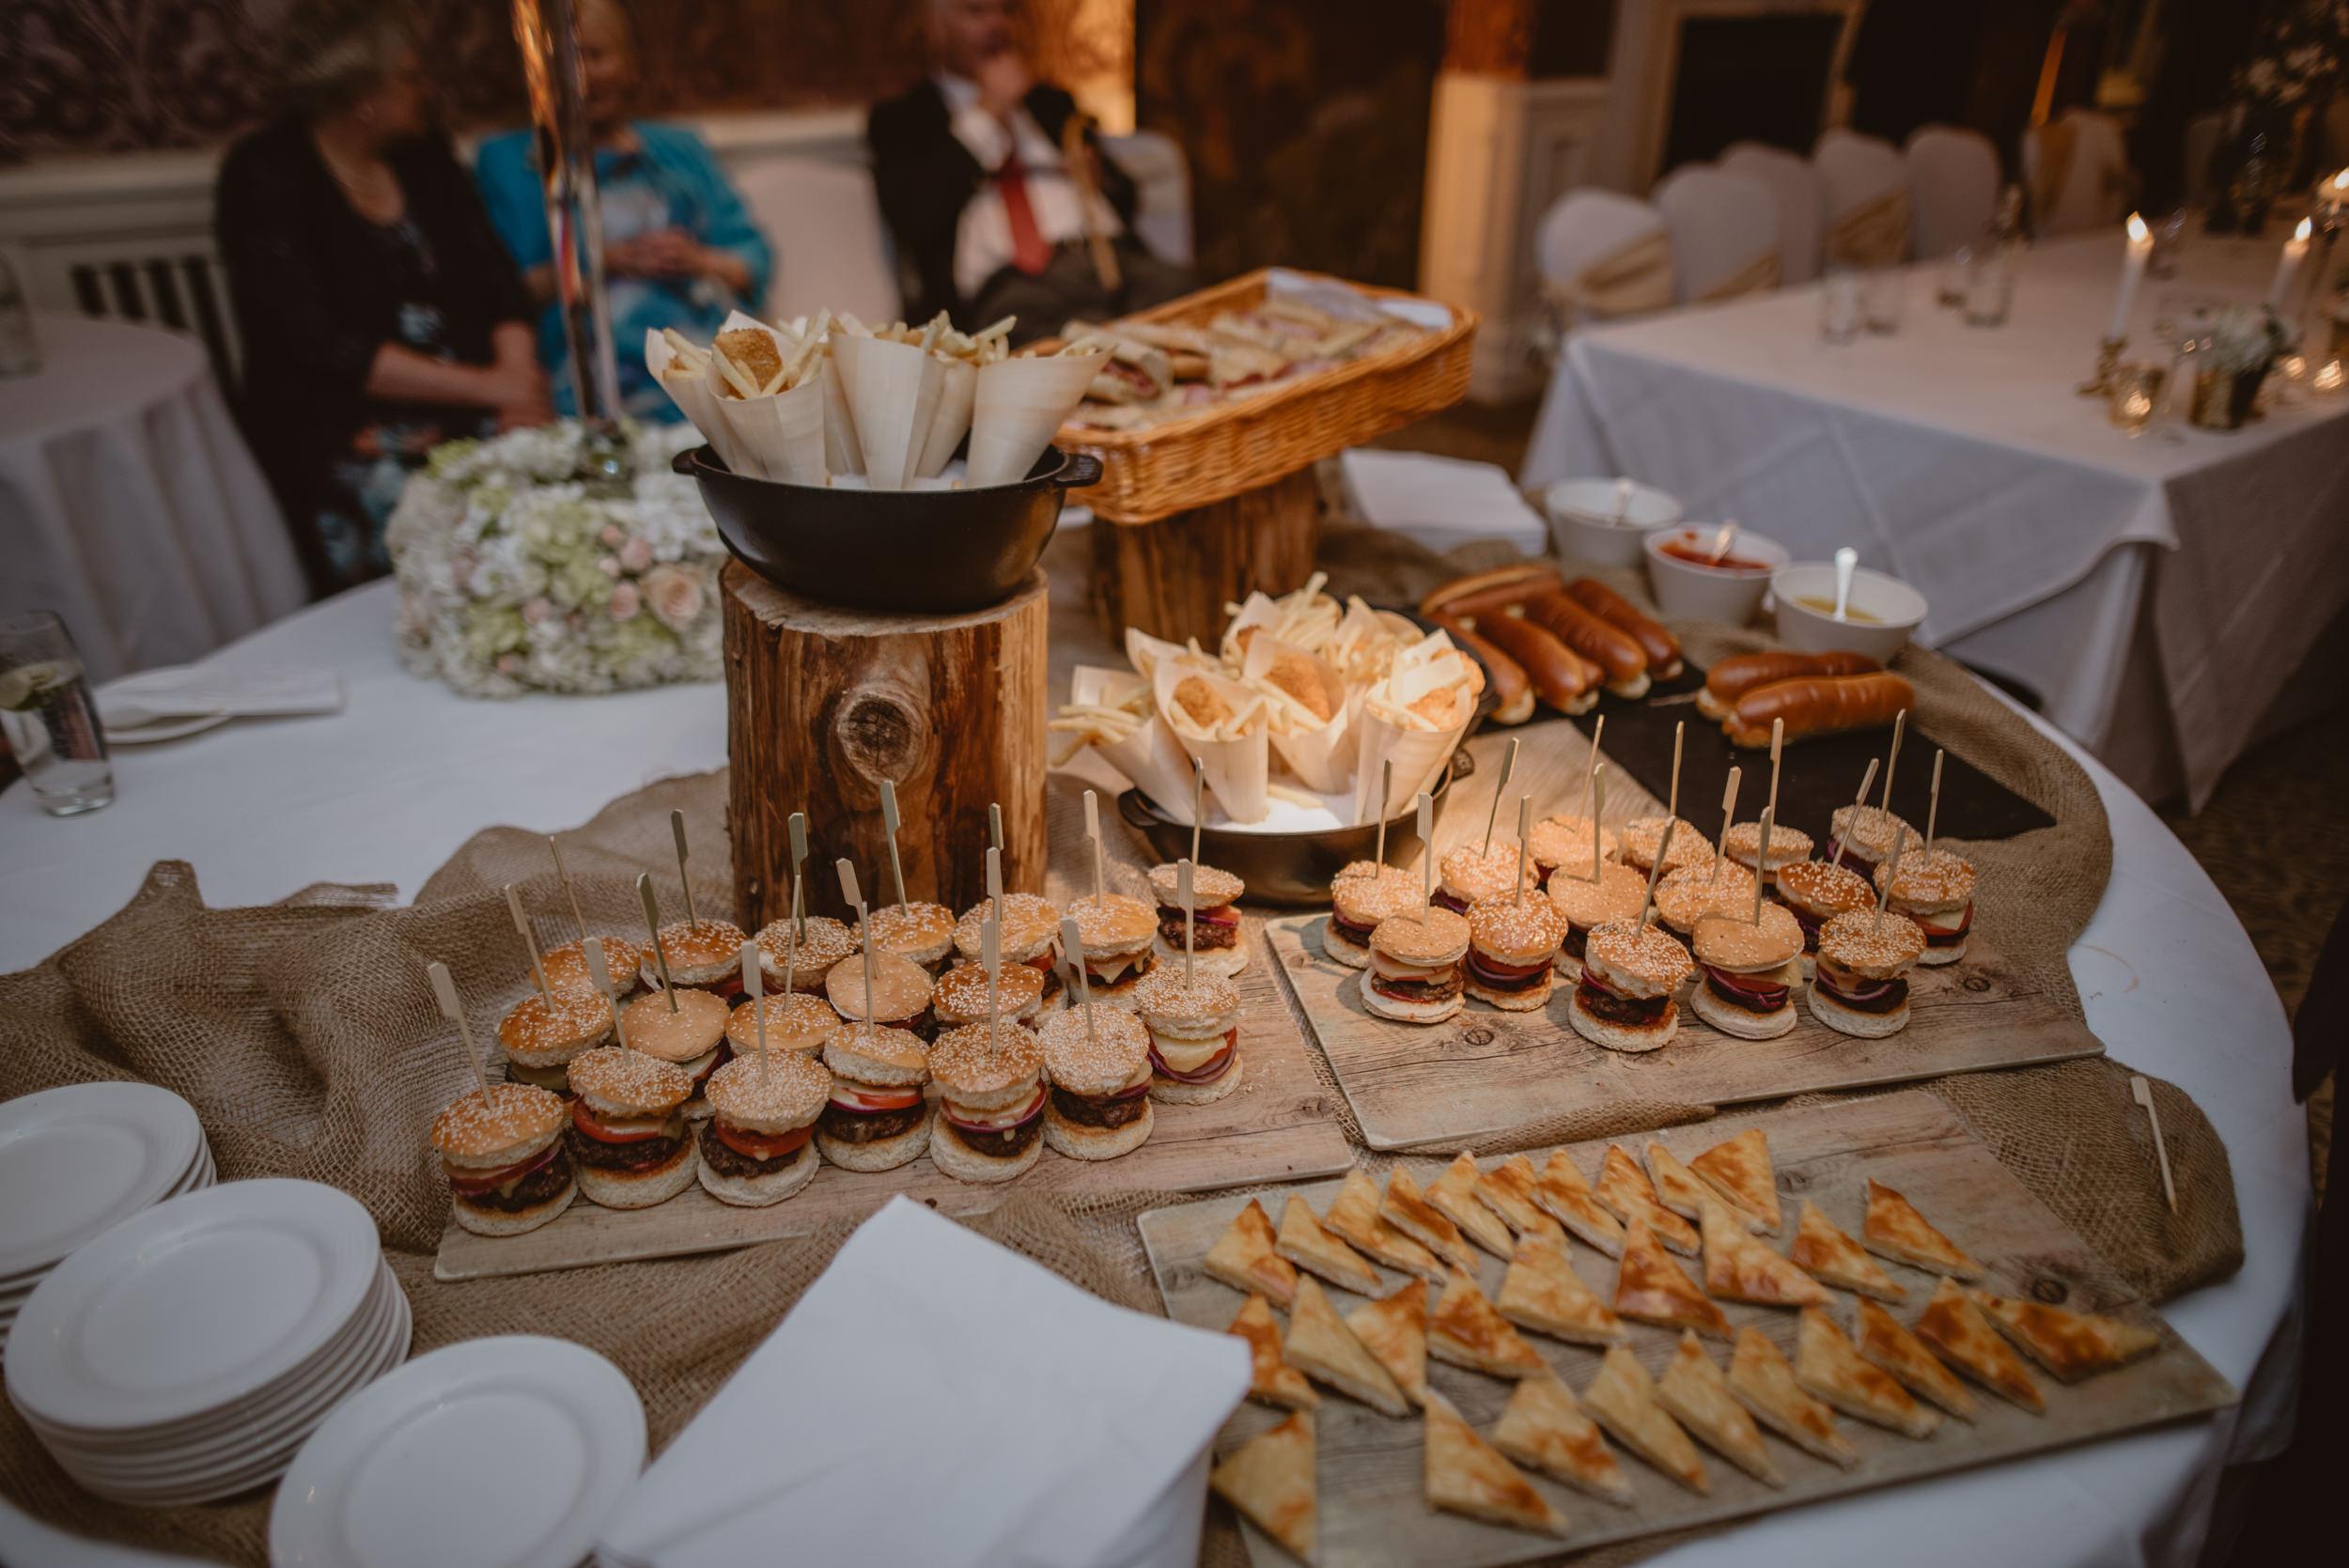 Trisha-and-Roger-wedding-The-Priory-Church-and-Chewton-Glen-Hotel-Christchurch-Manu-Mendoza-Wedding-Photography-491.jpg